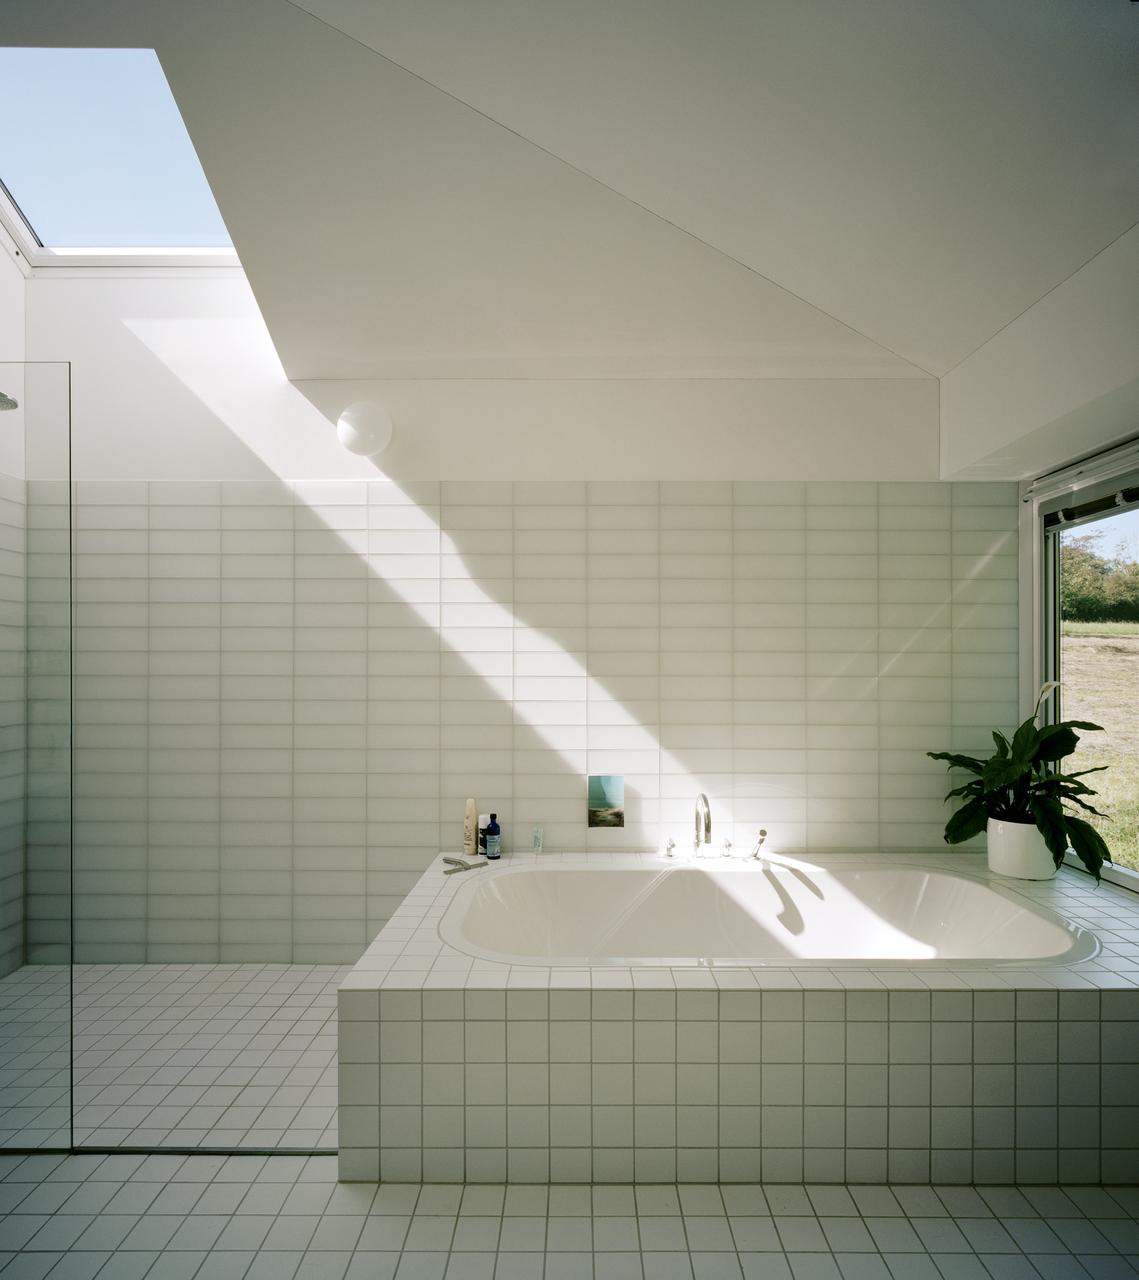 badkamer #velux #white | Beeldige badkamers | Pinterest | Window and ...